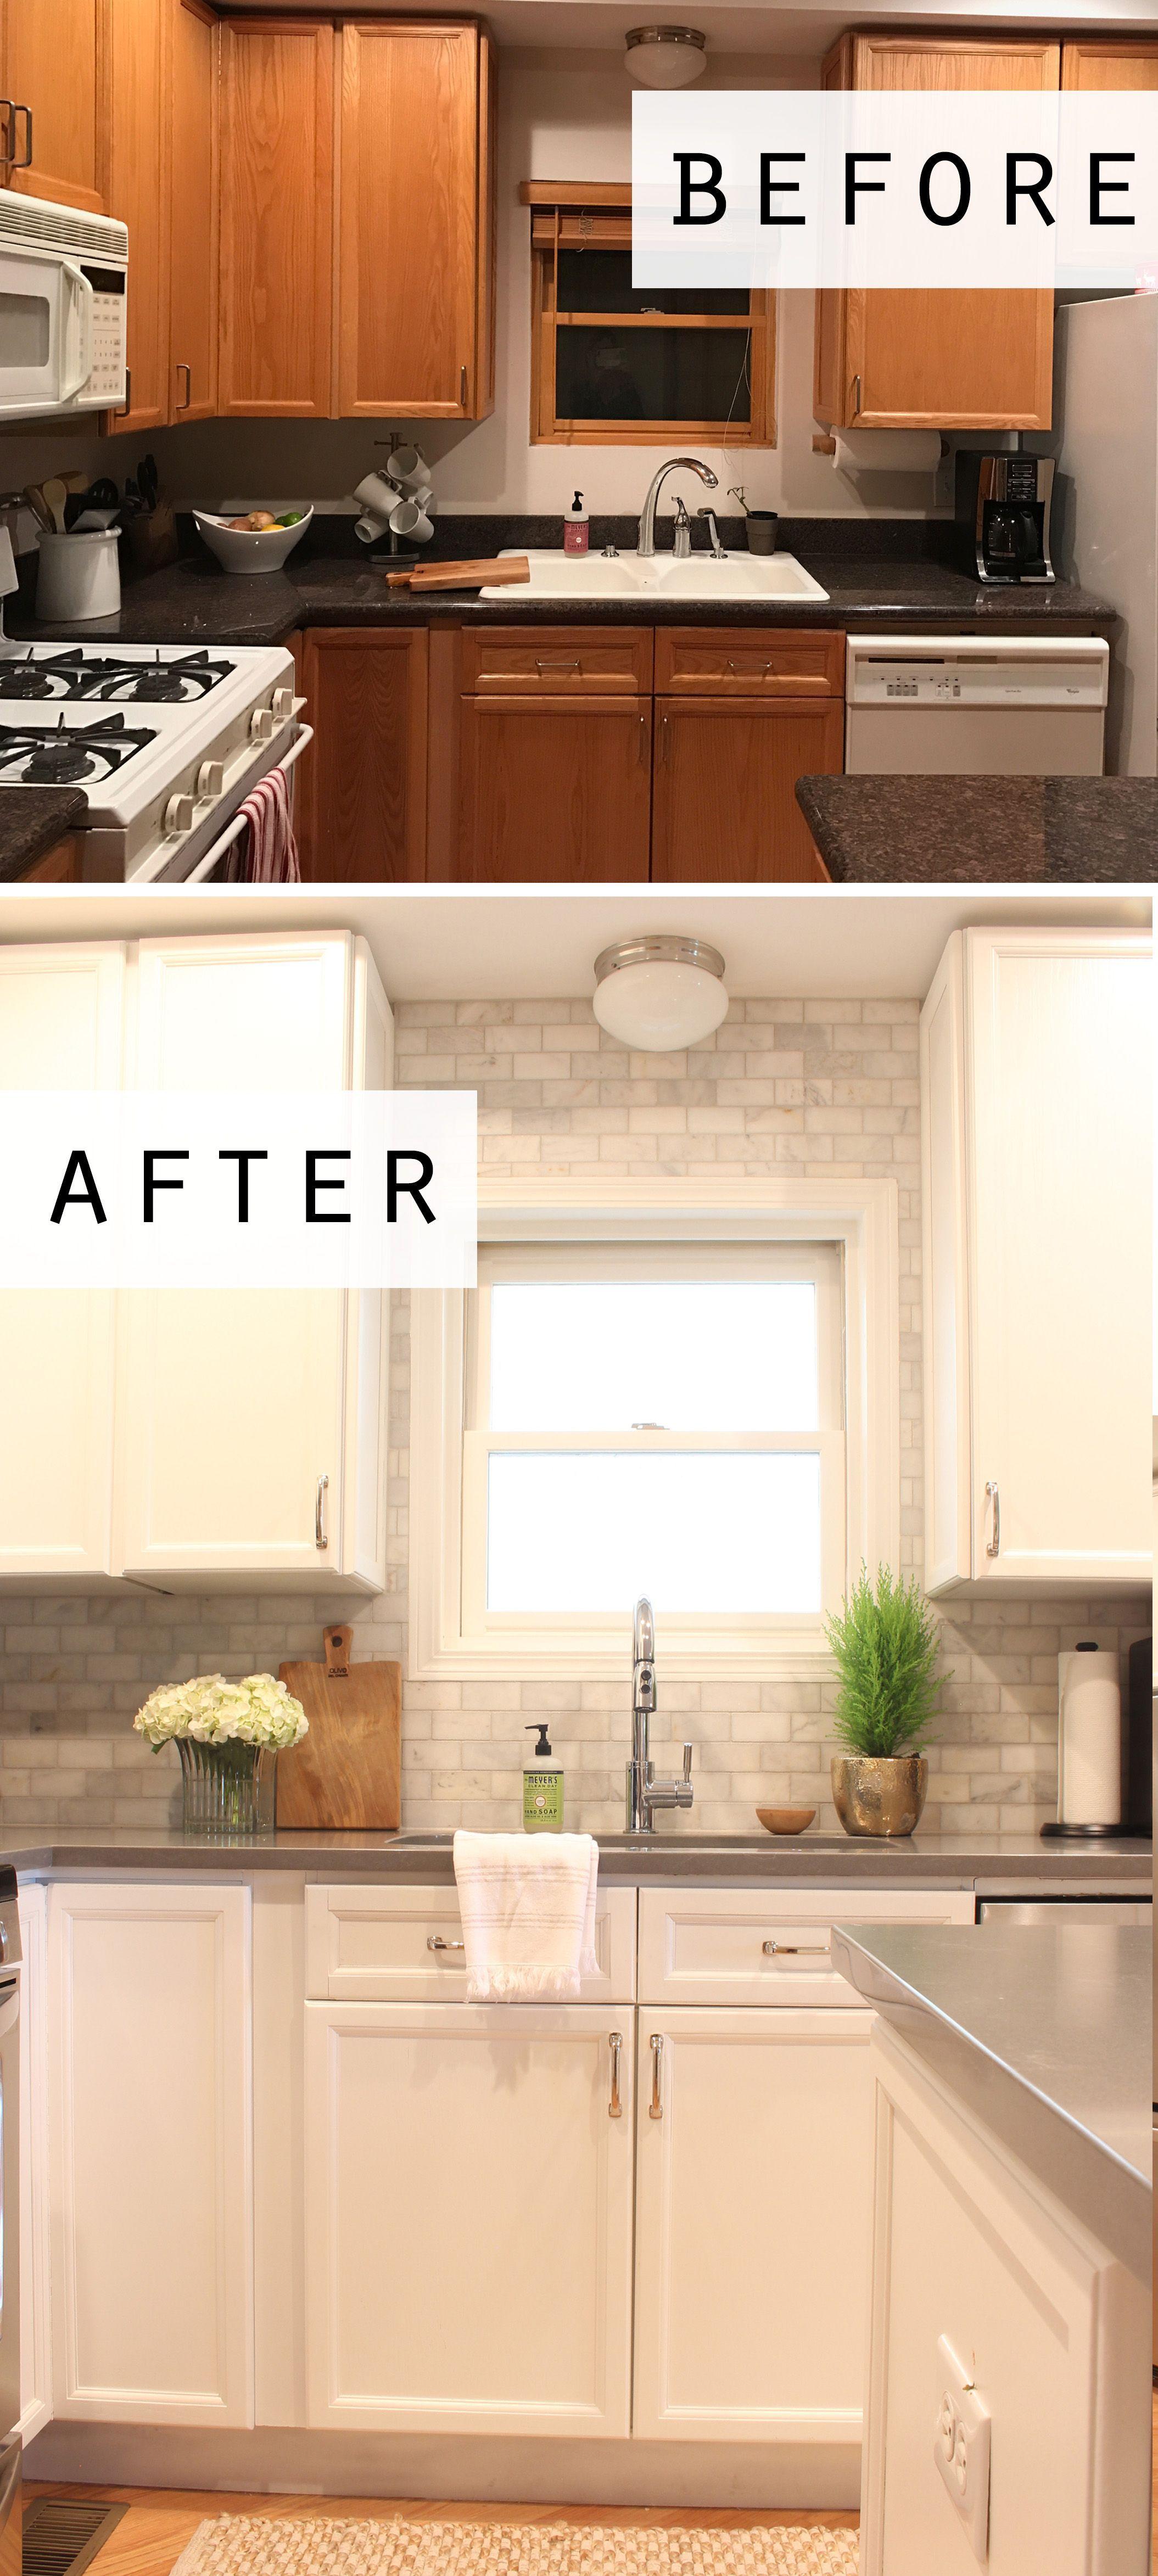 Jen & Tyler's Lincoln Park Condo Kitchen Makeover - Design Evolving